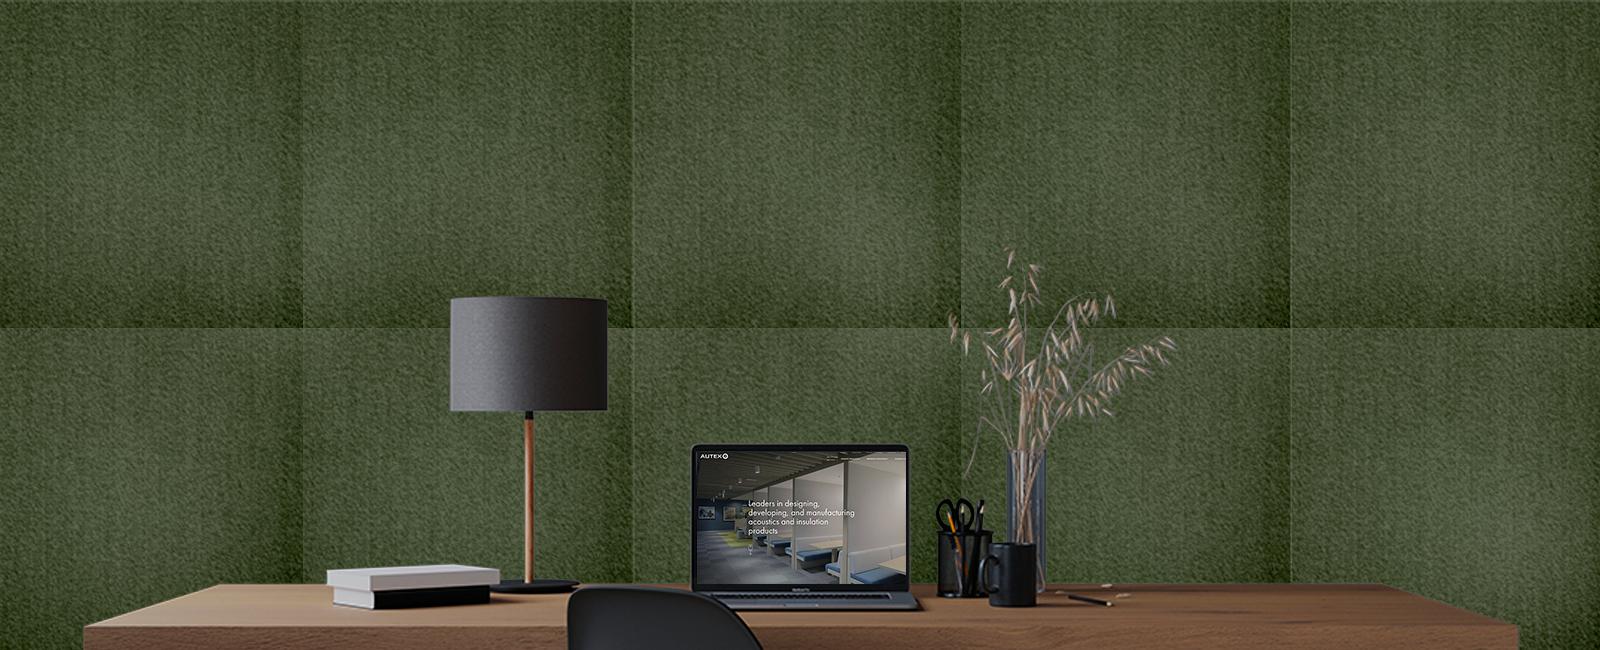 Autex Composition Peel 'n' Stick Tiles | Avocado